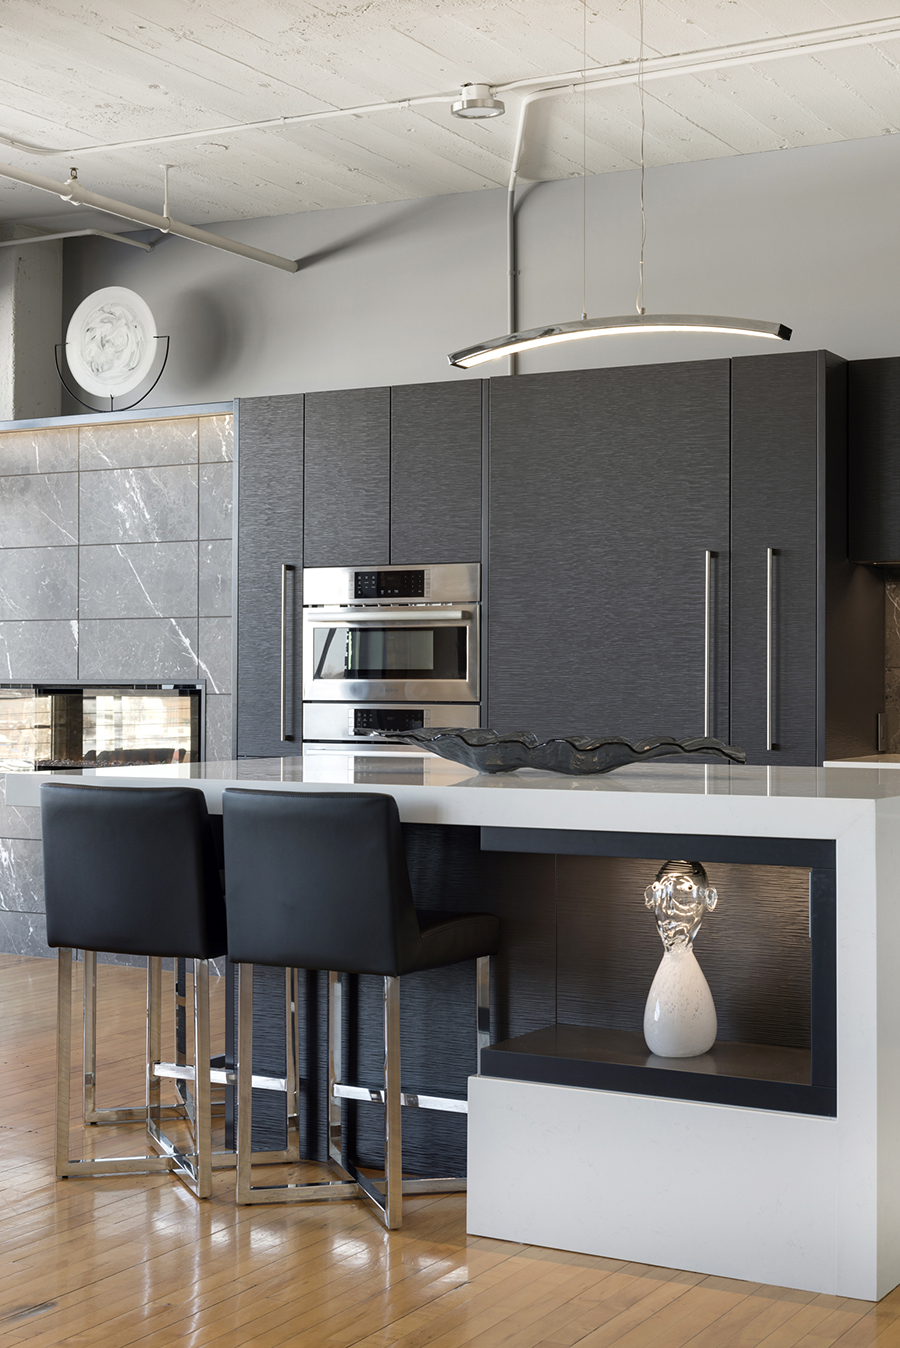 Belle Kitchen Interior Designer Design Minneapolis MN Minnesota Twin Cities 002.jpg